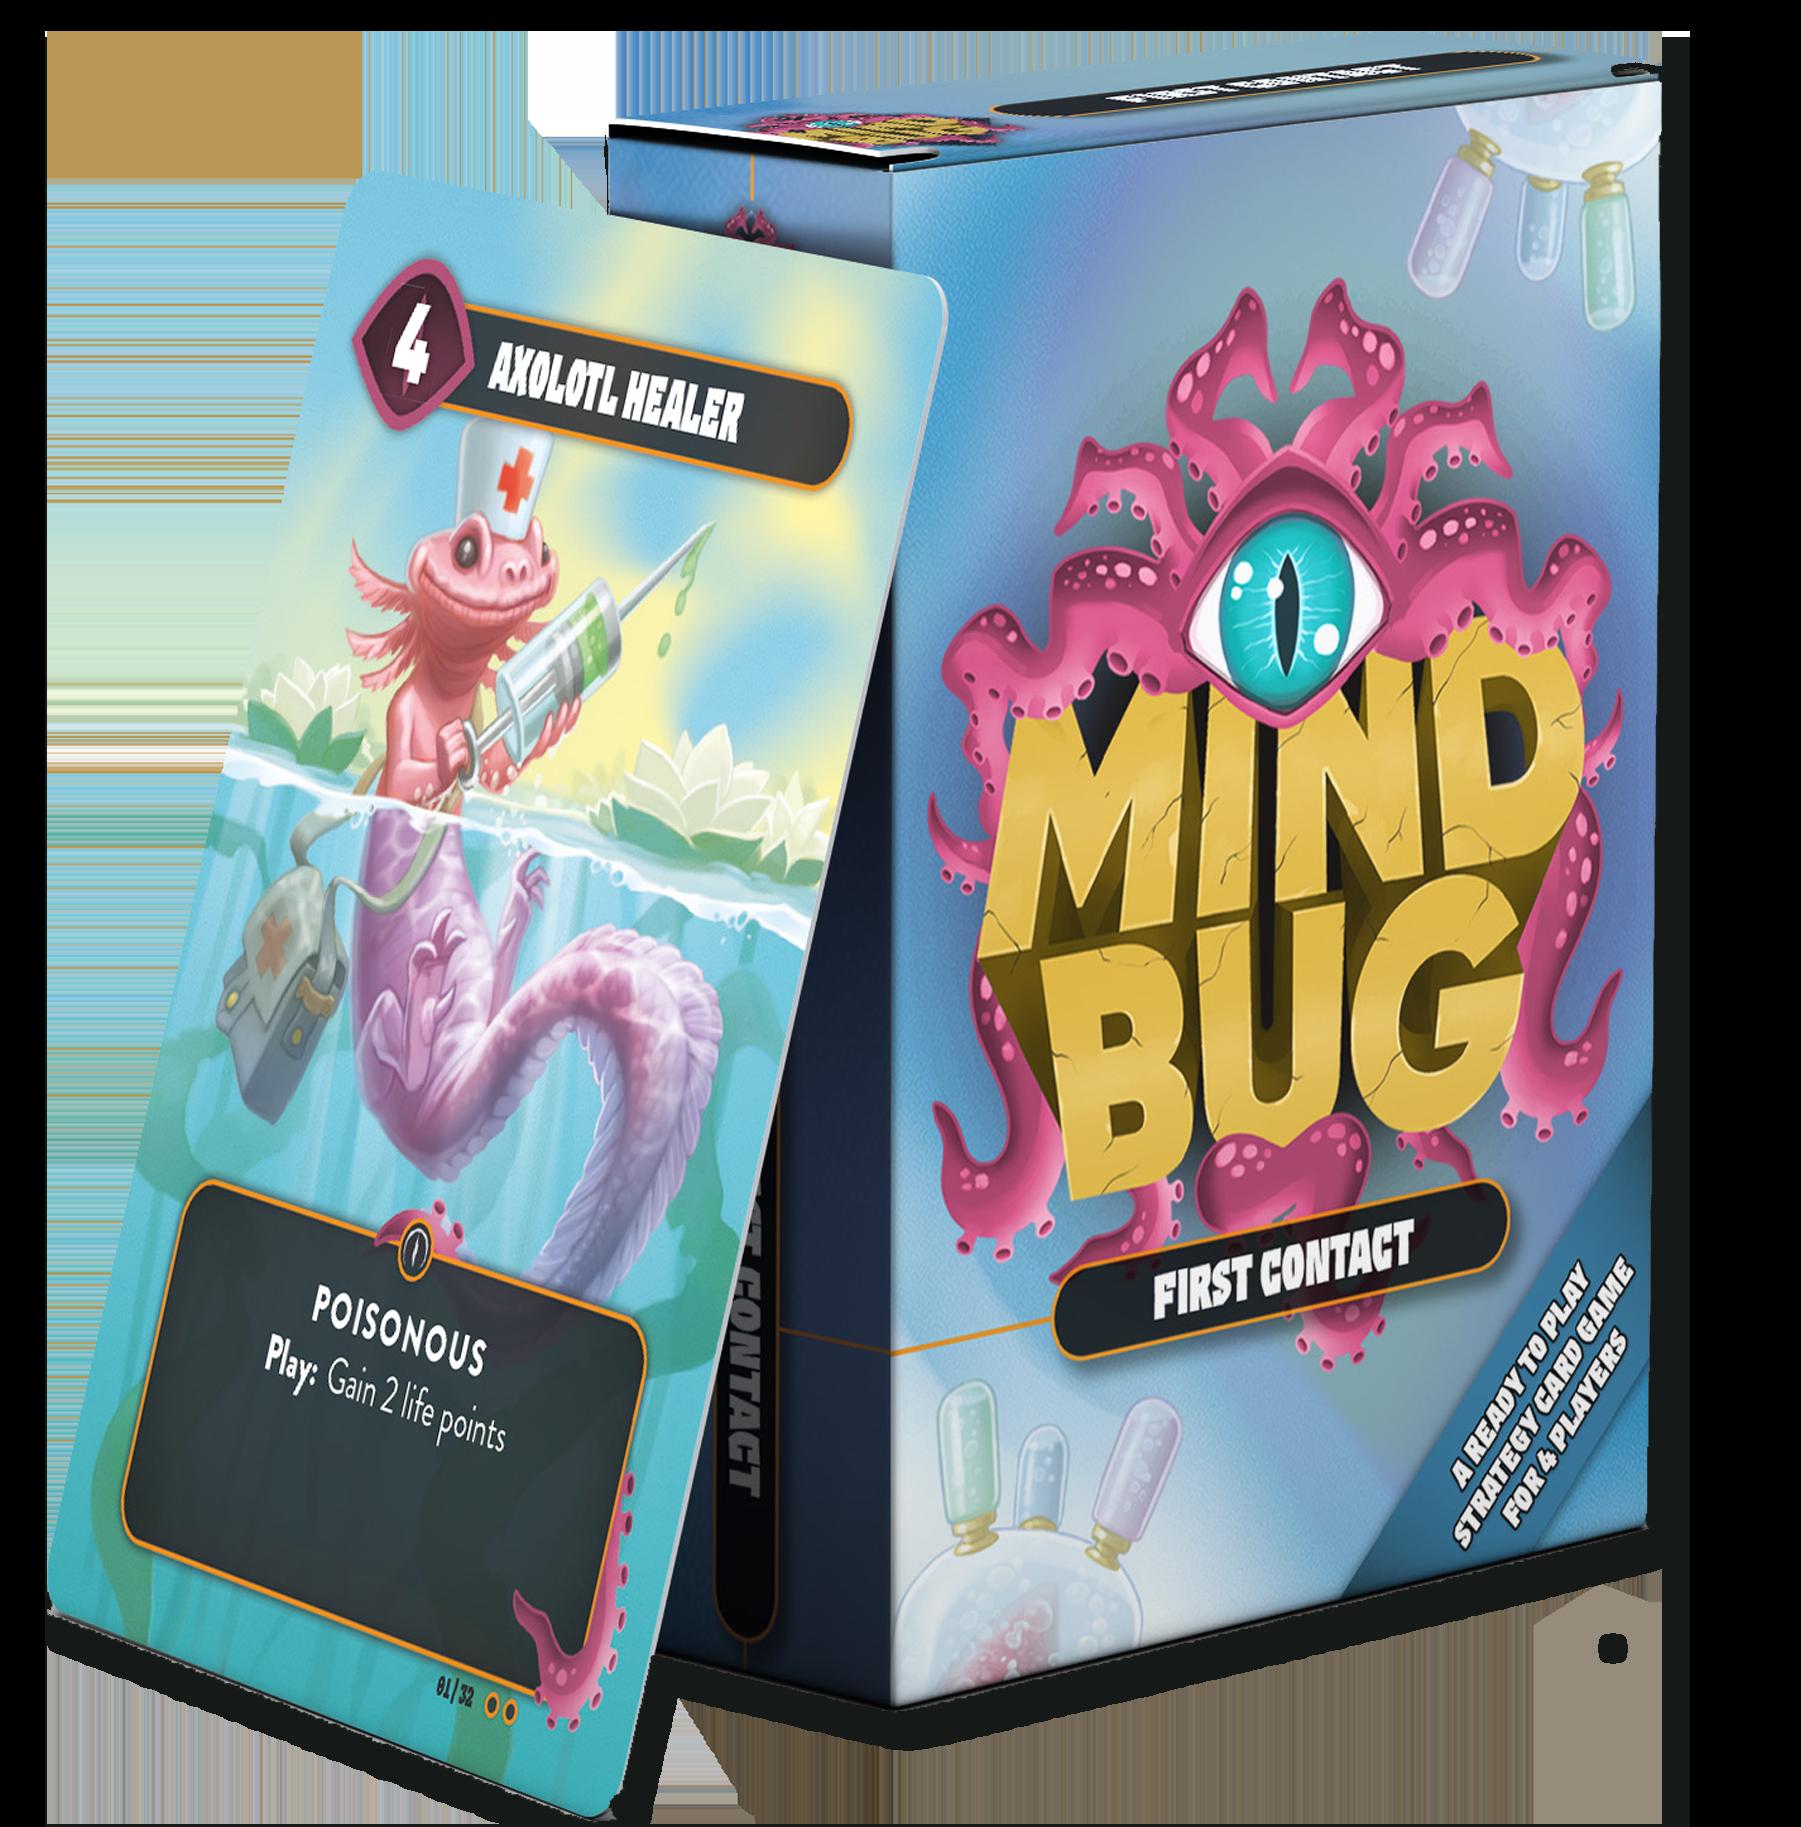 Mindbug Box